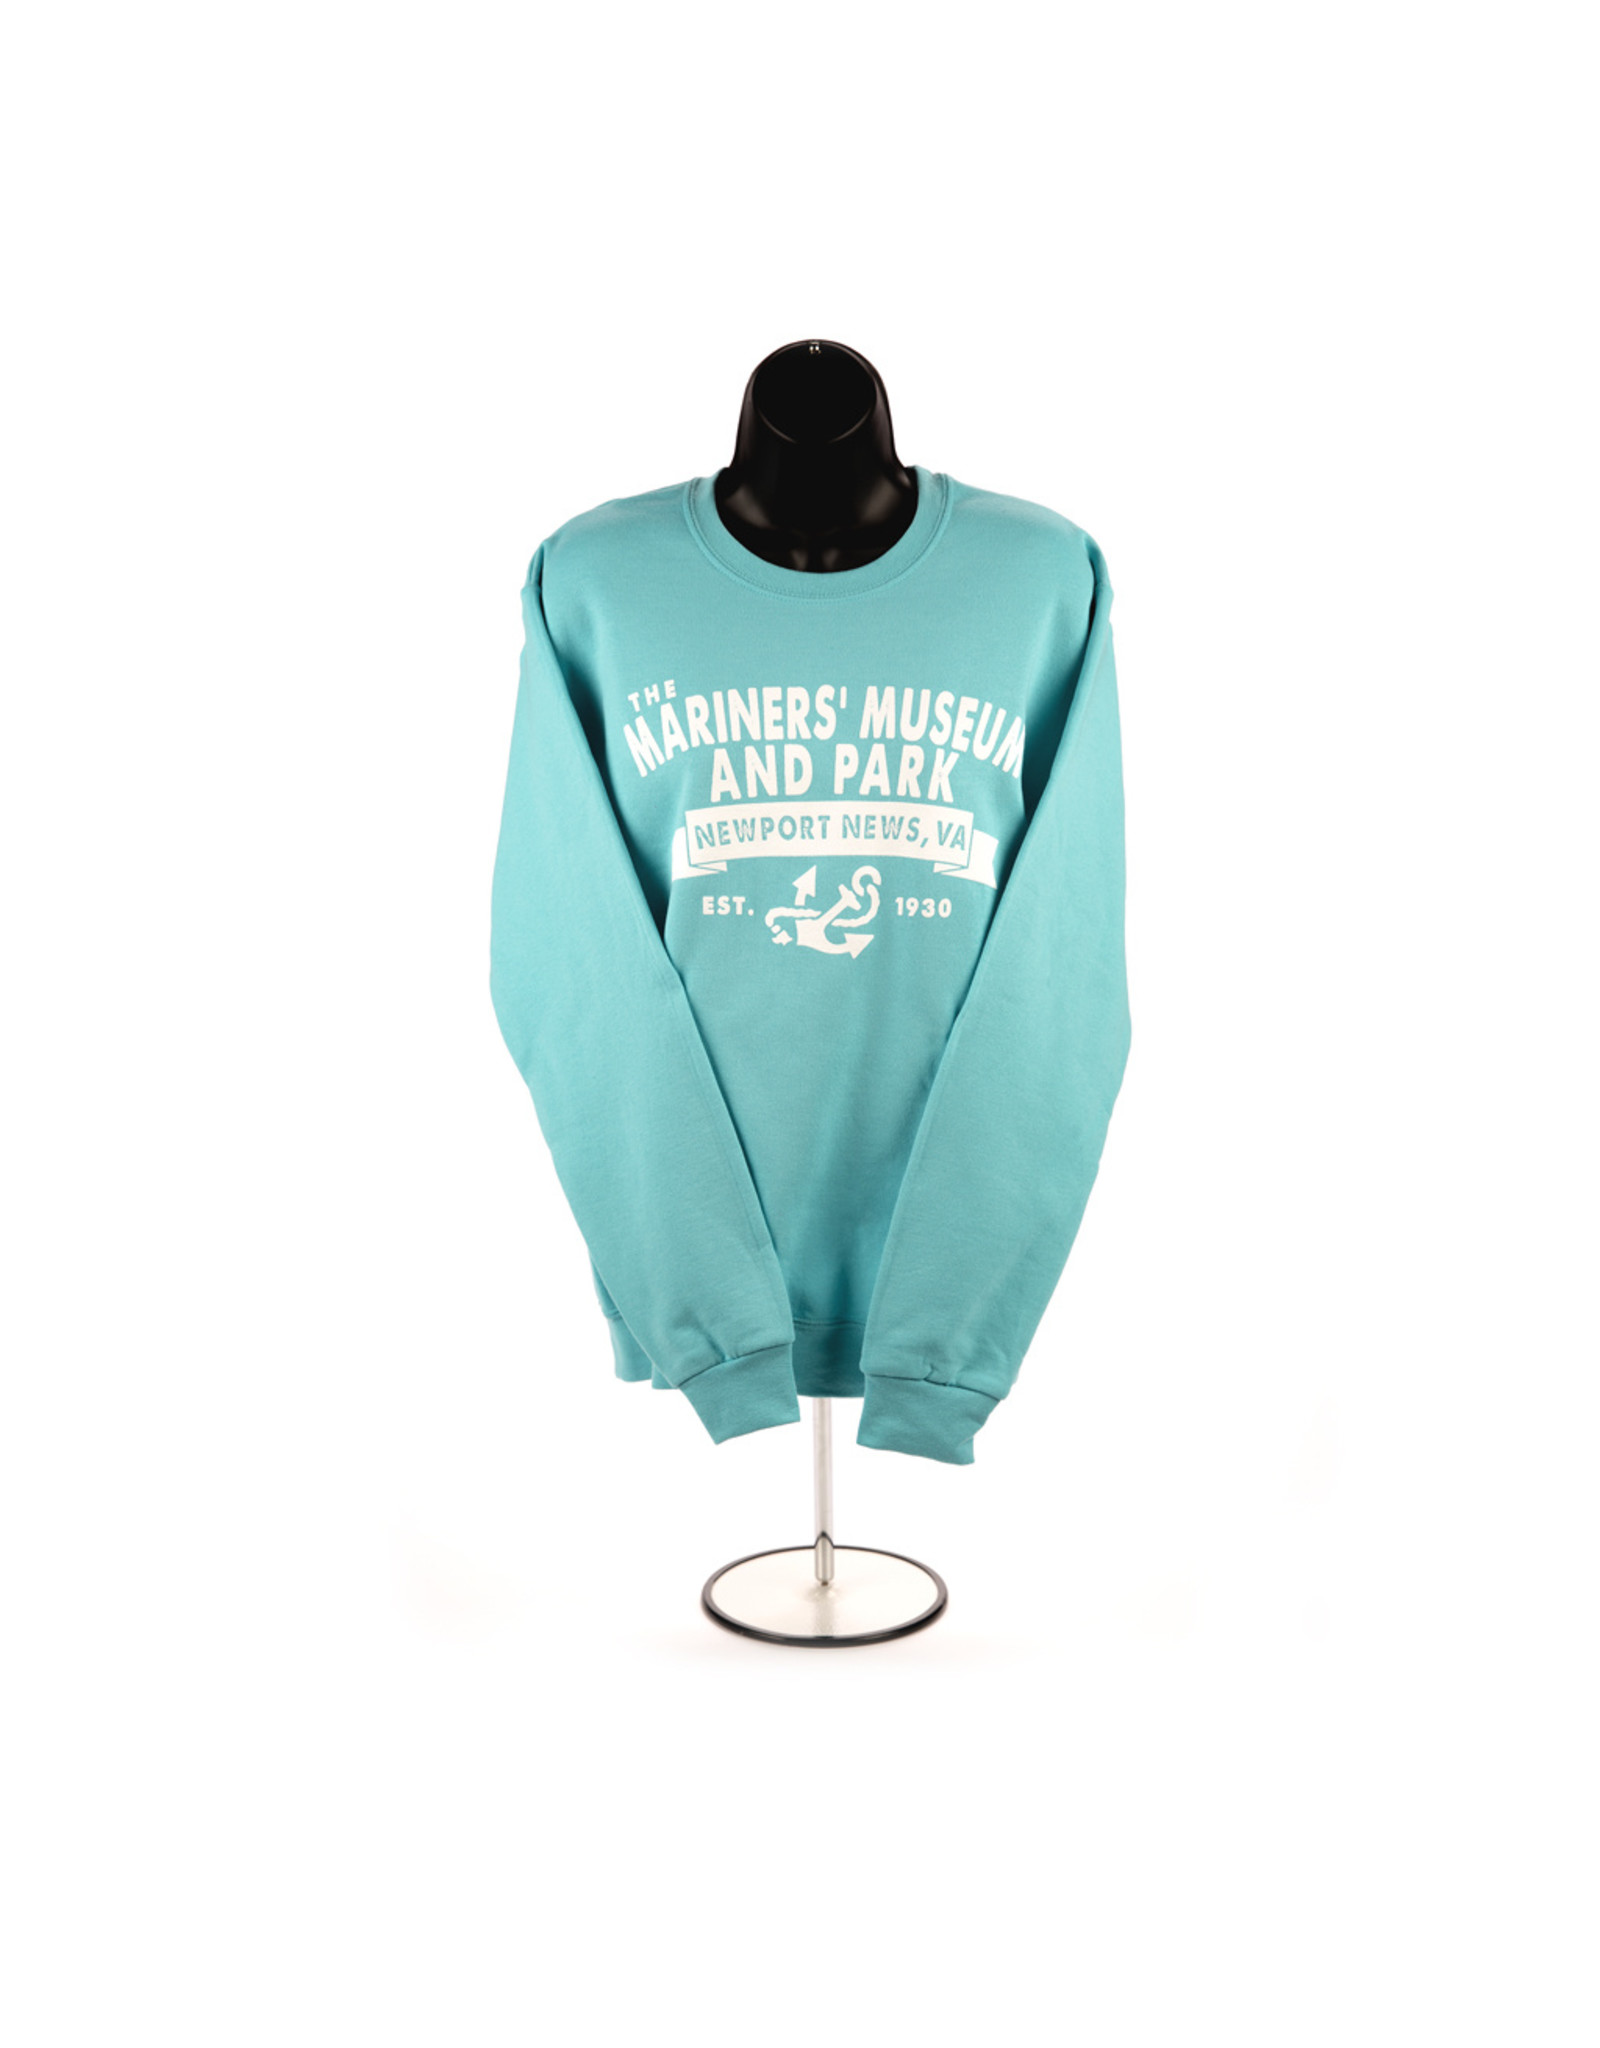 The Mariners' Museum and Park Banner Crewneck Sweatshirt